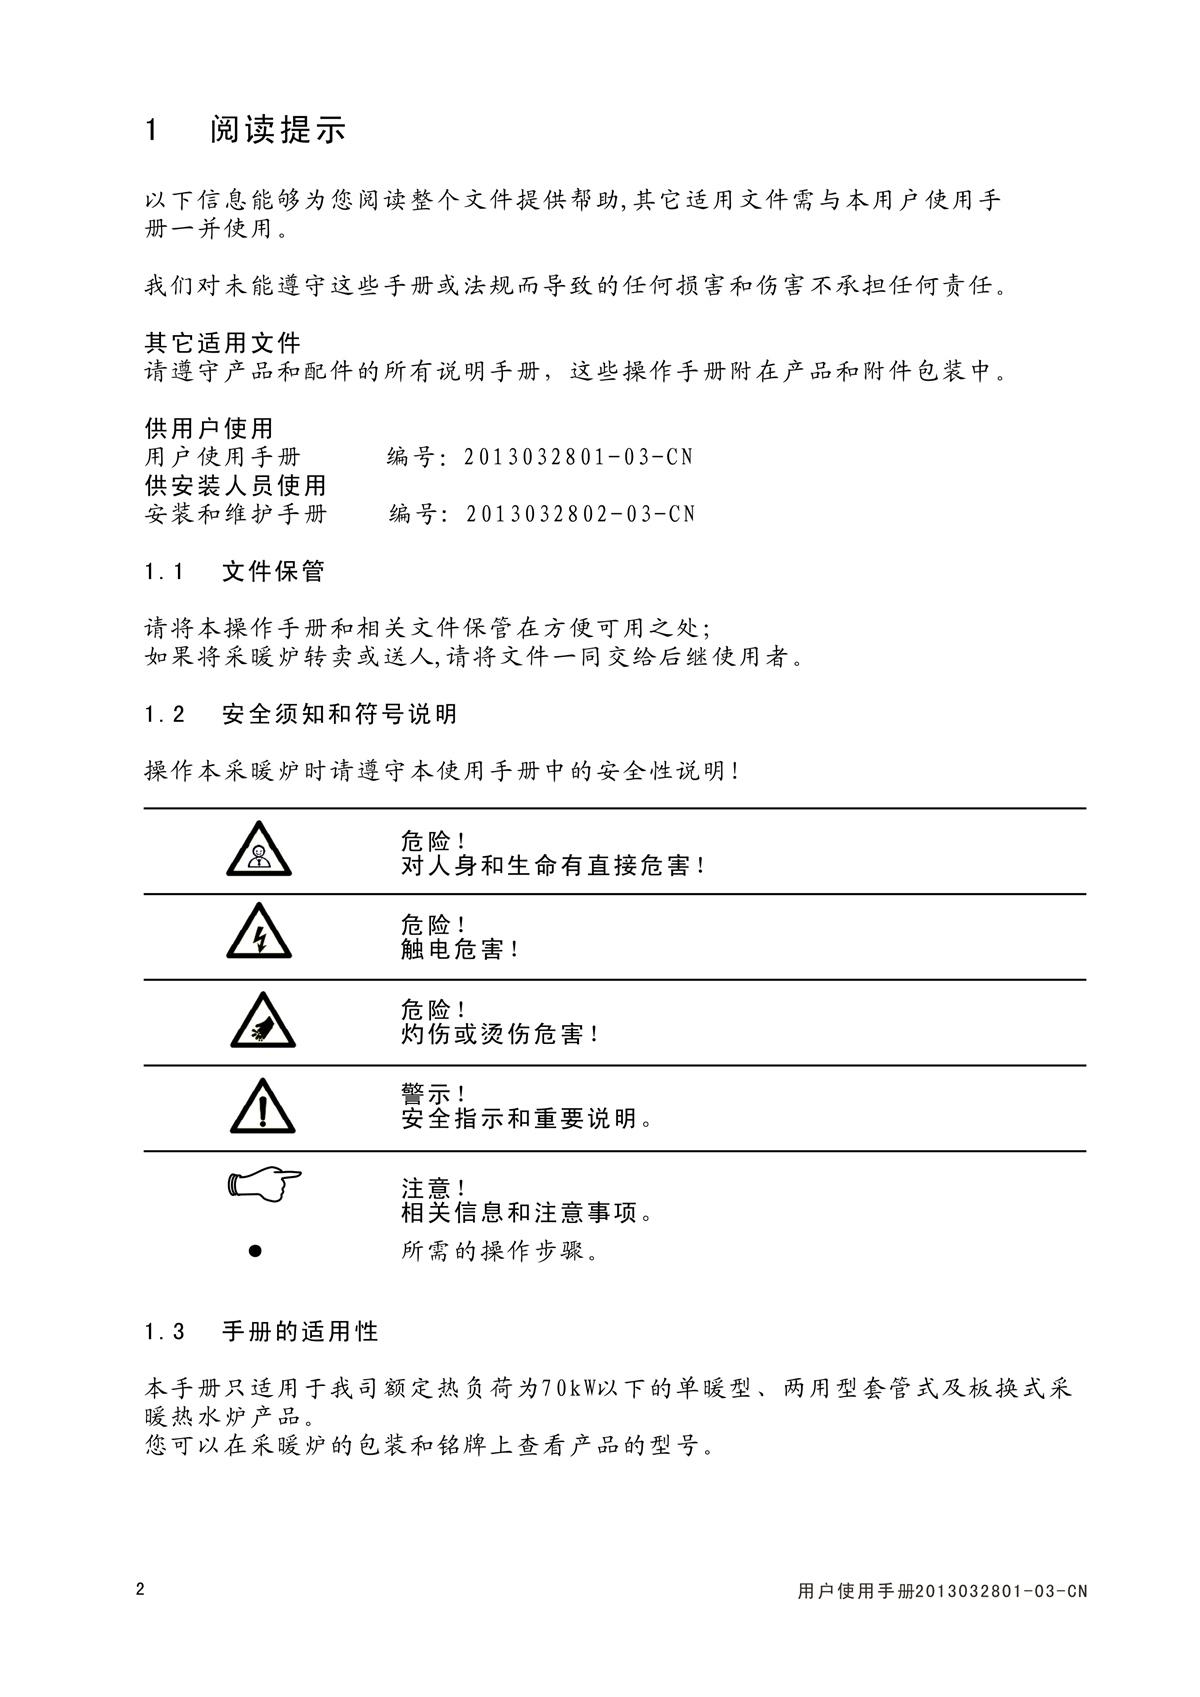 ES06系列-用户使用手册-3_01.jpg